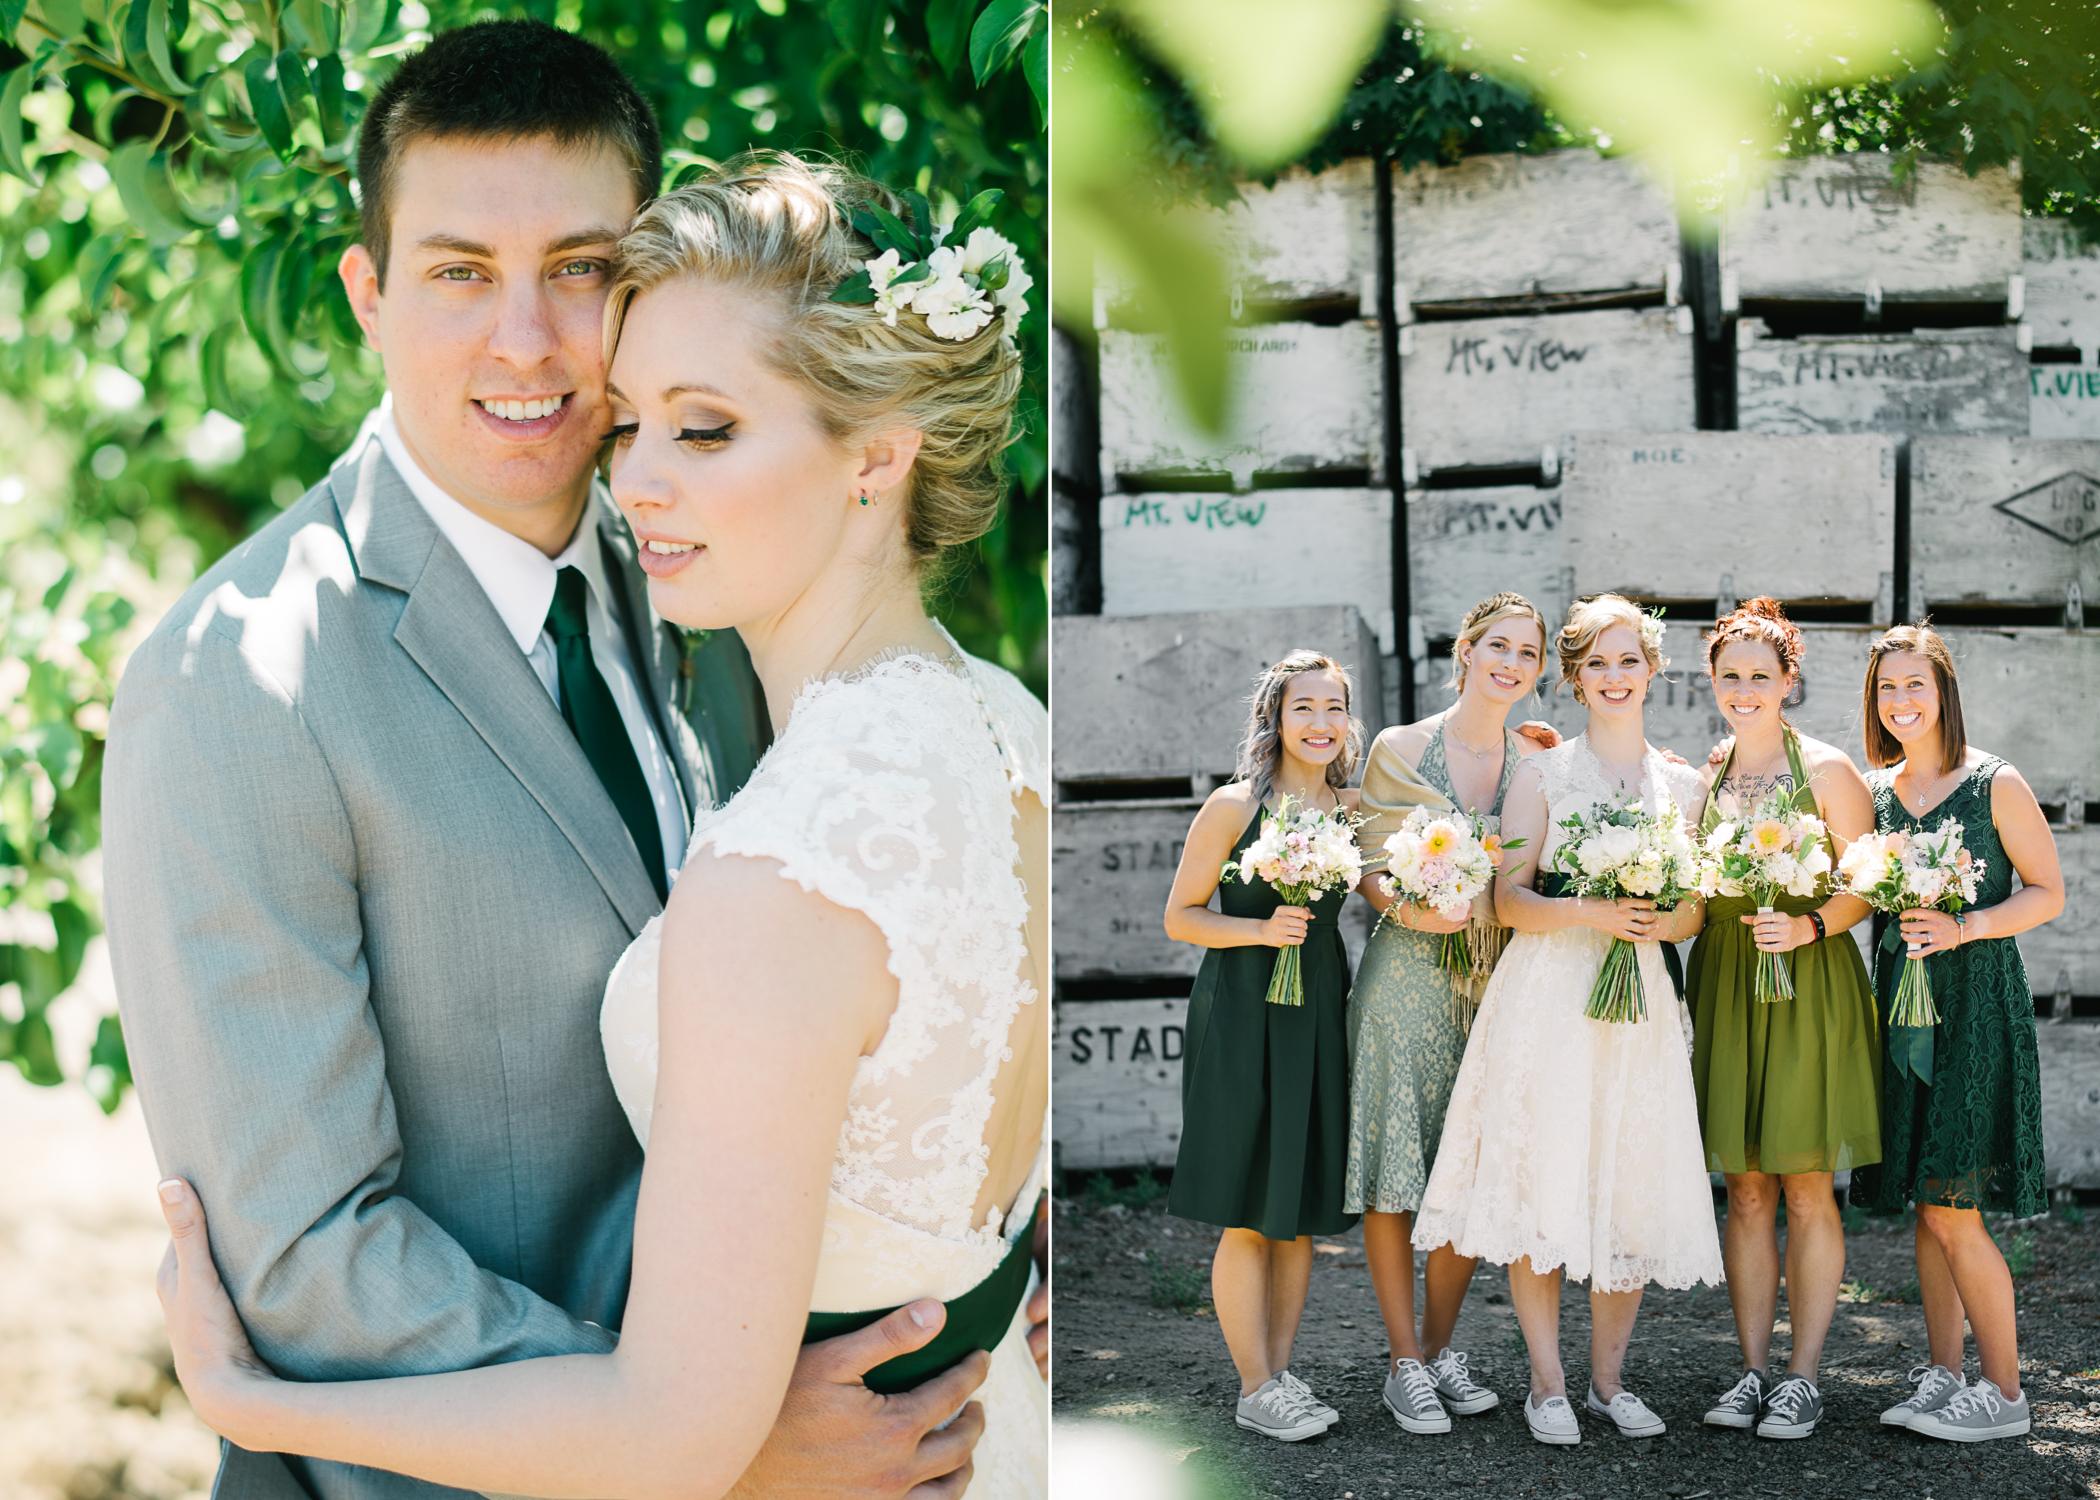 006-portland-wedding-photography-best-2018.jpg